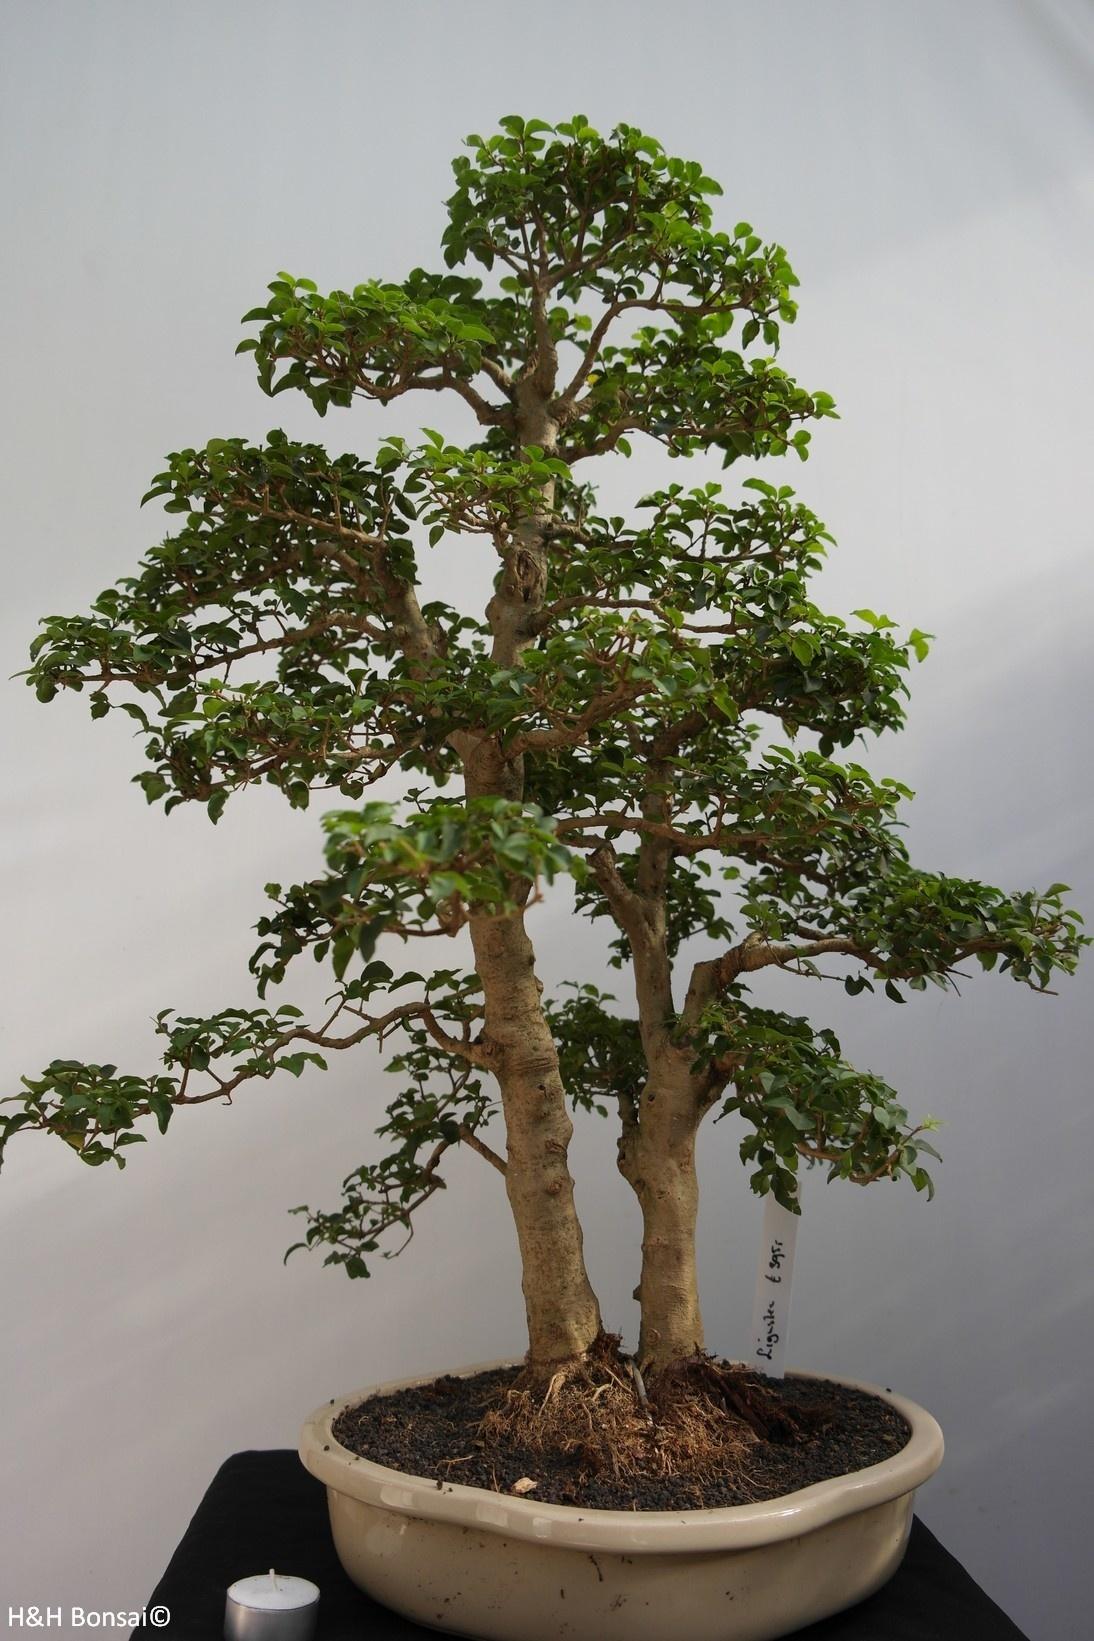 Bonsai Privet, Ligustrumsinense, no. 7841